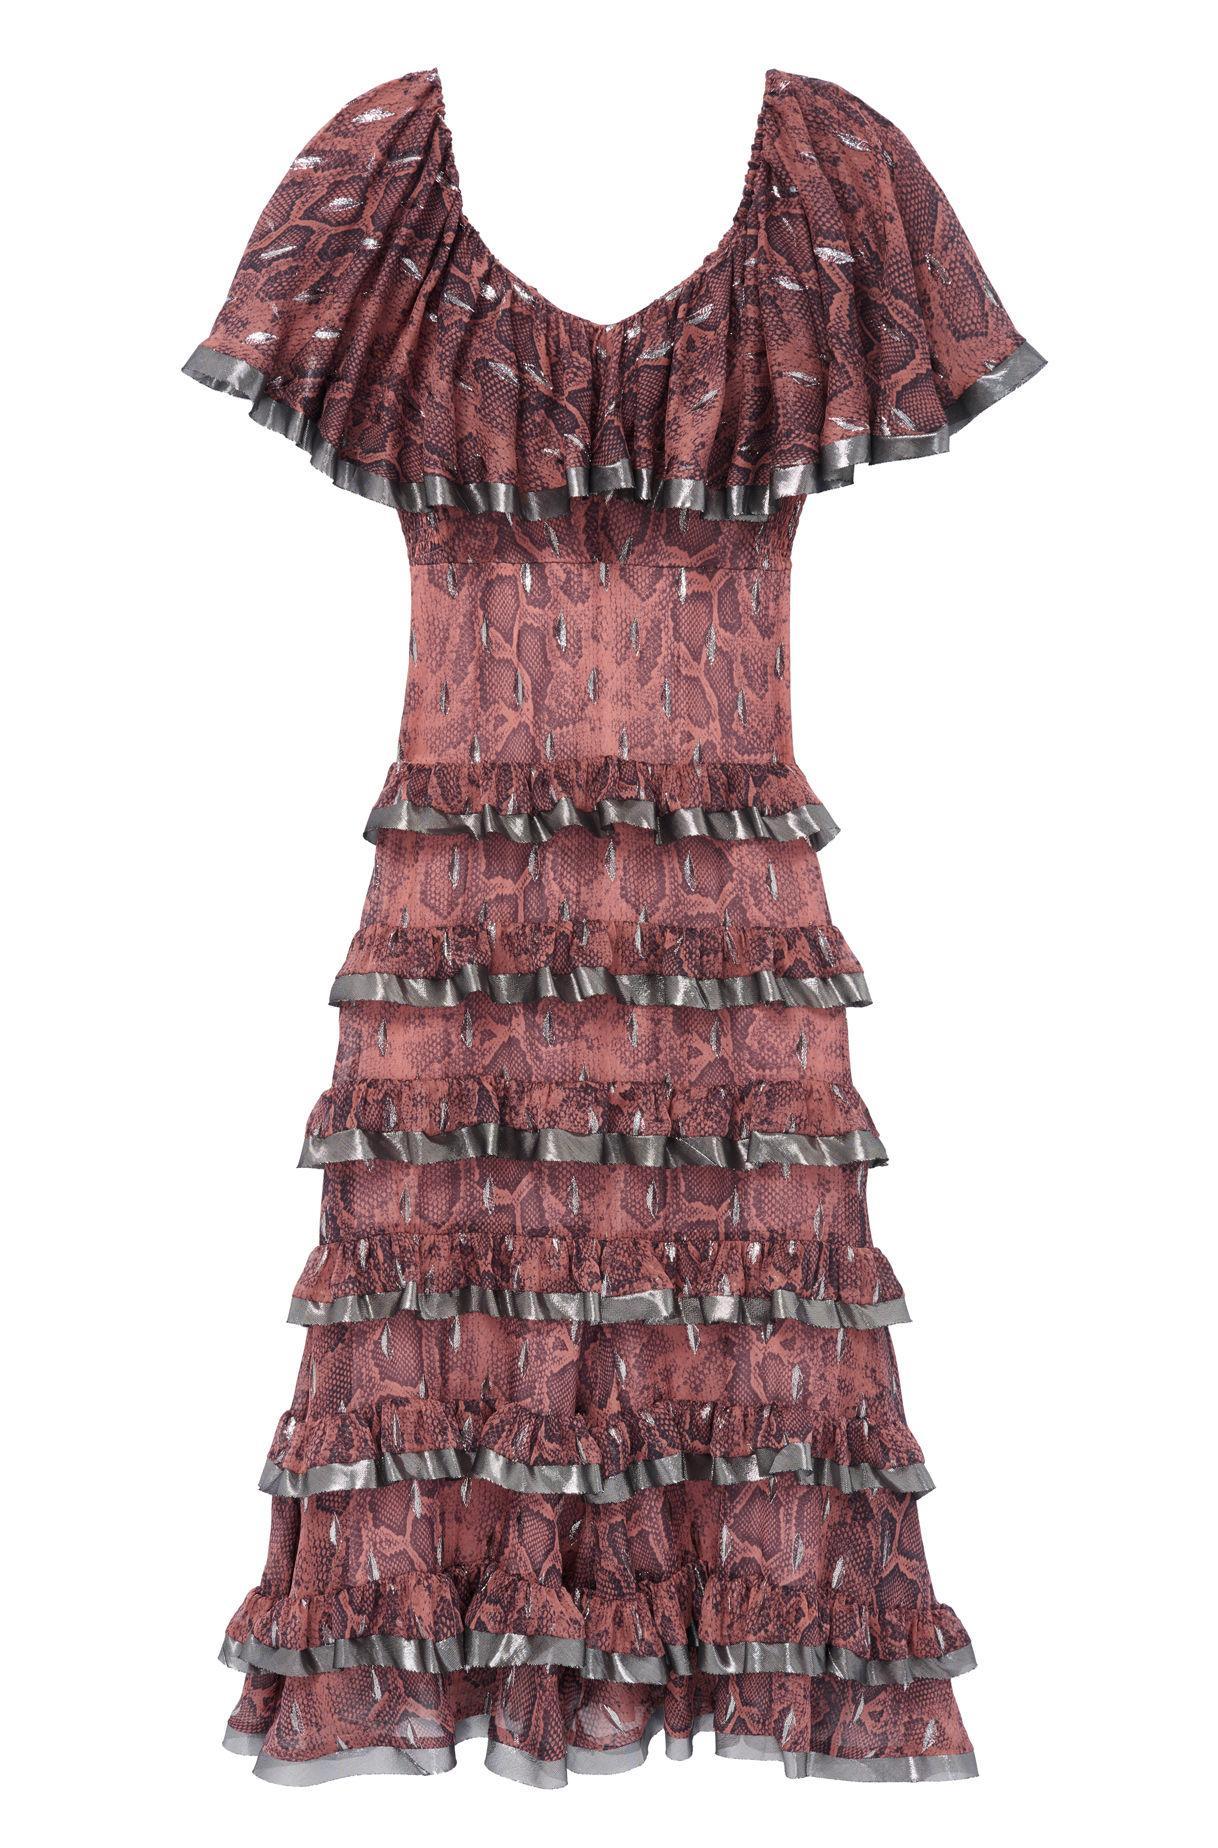 da1c8cbd4e8f Lyst - Rebecca Taylor Snake Print Tiered Ruffle Dress - Save 40%